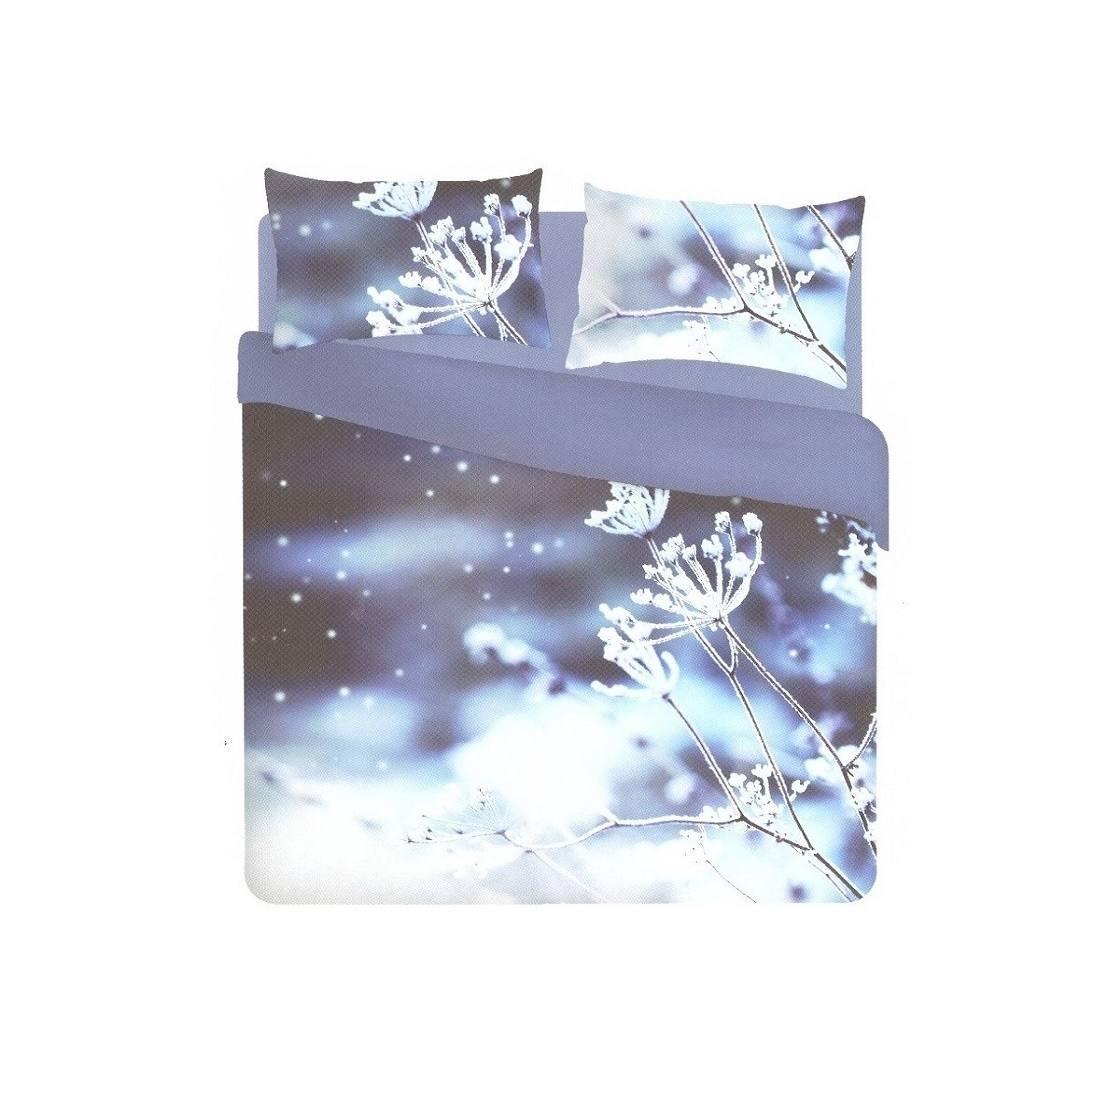 Copripiumino Matrimoniale Frozen.Parure Copripiumino Matrimoniale Stampa Digitale Frozen Cotone Ebay